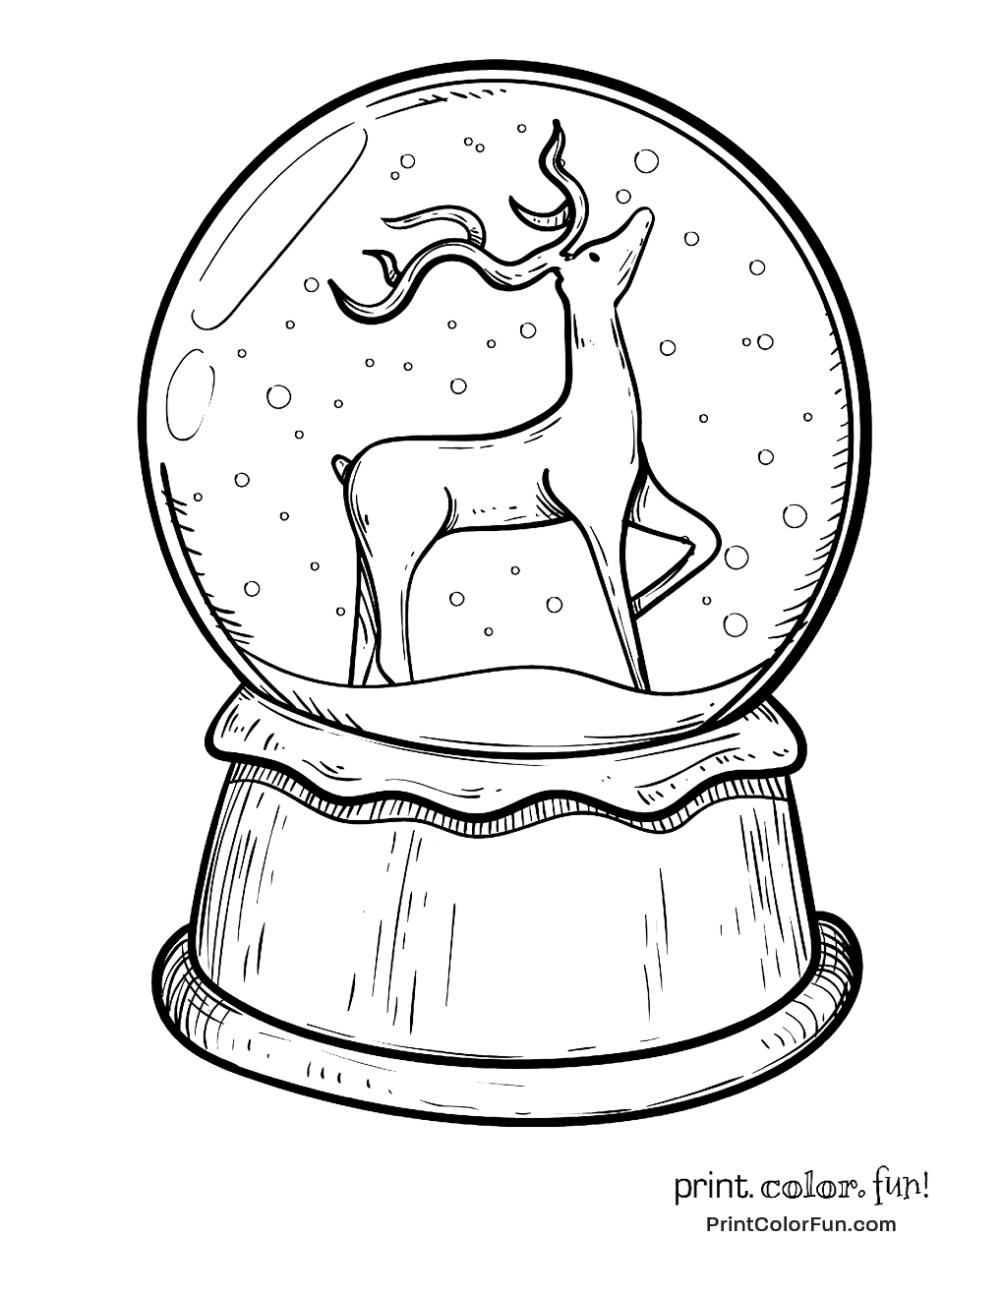 Color Christmas Pictures To Draw.Christmas Snow Globe With Reindeer Christmas Christmas